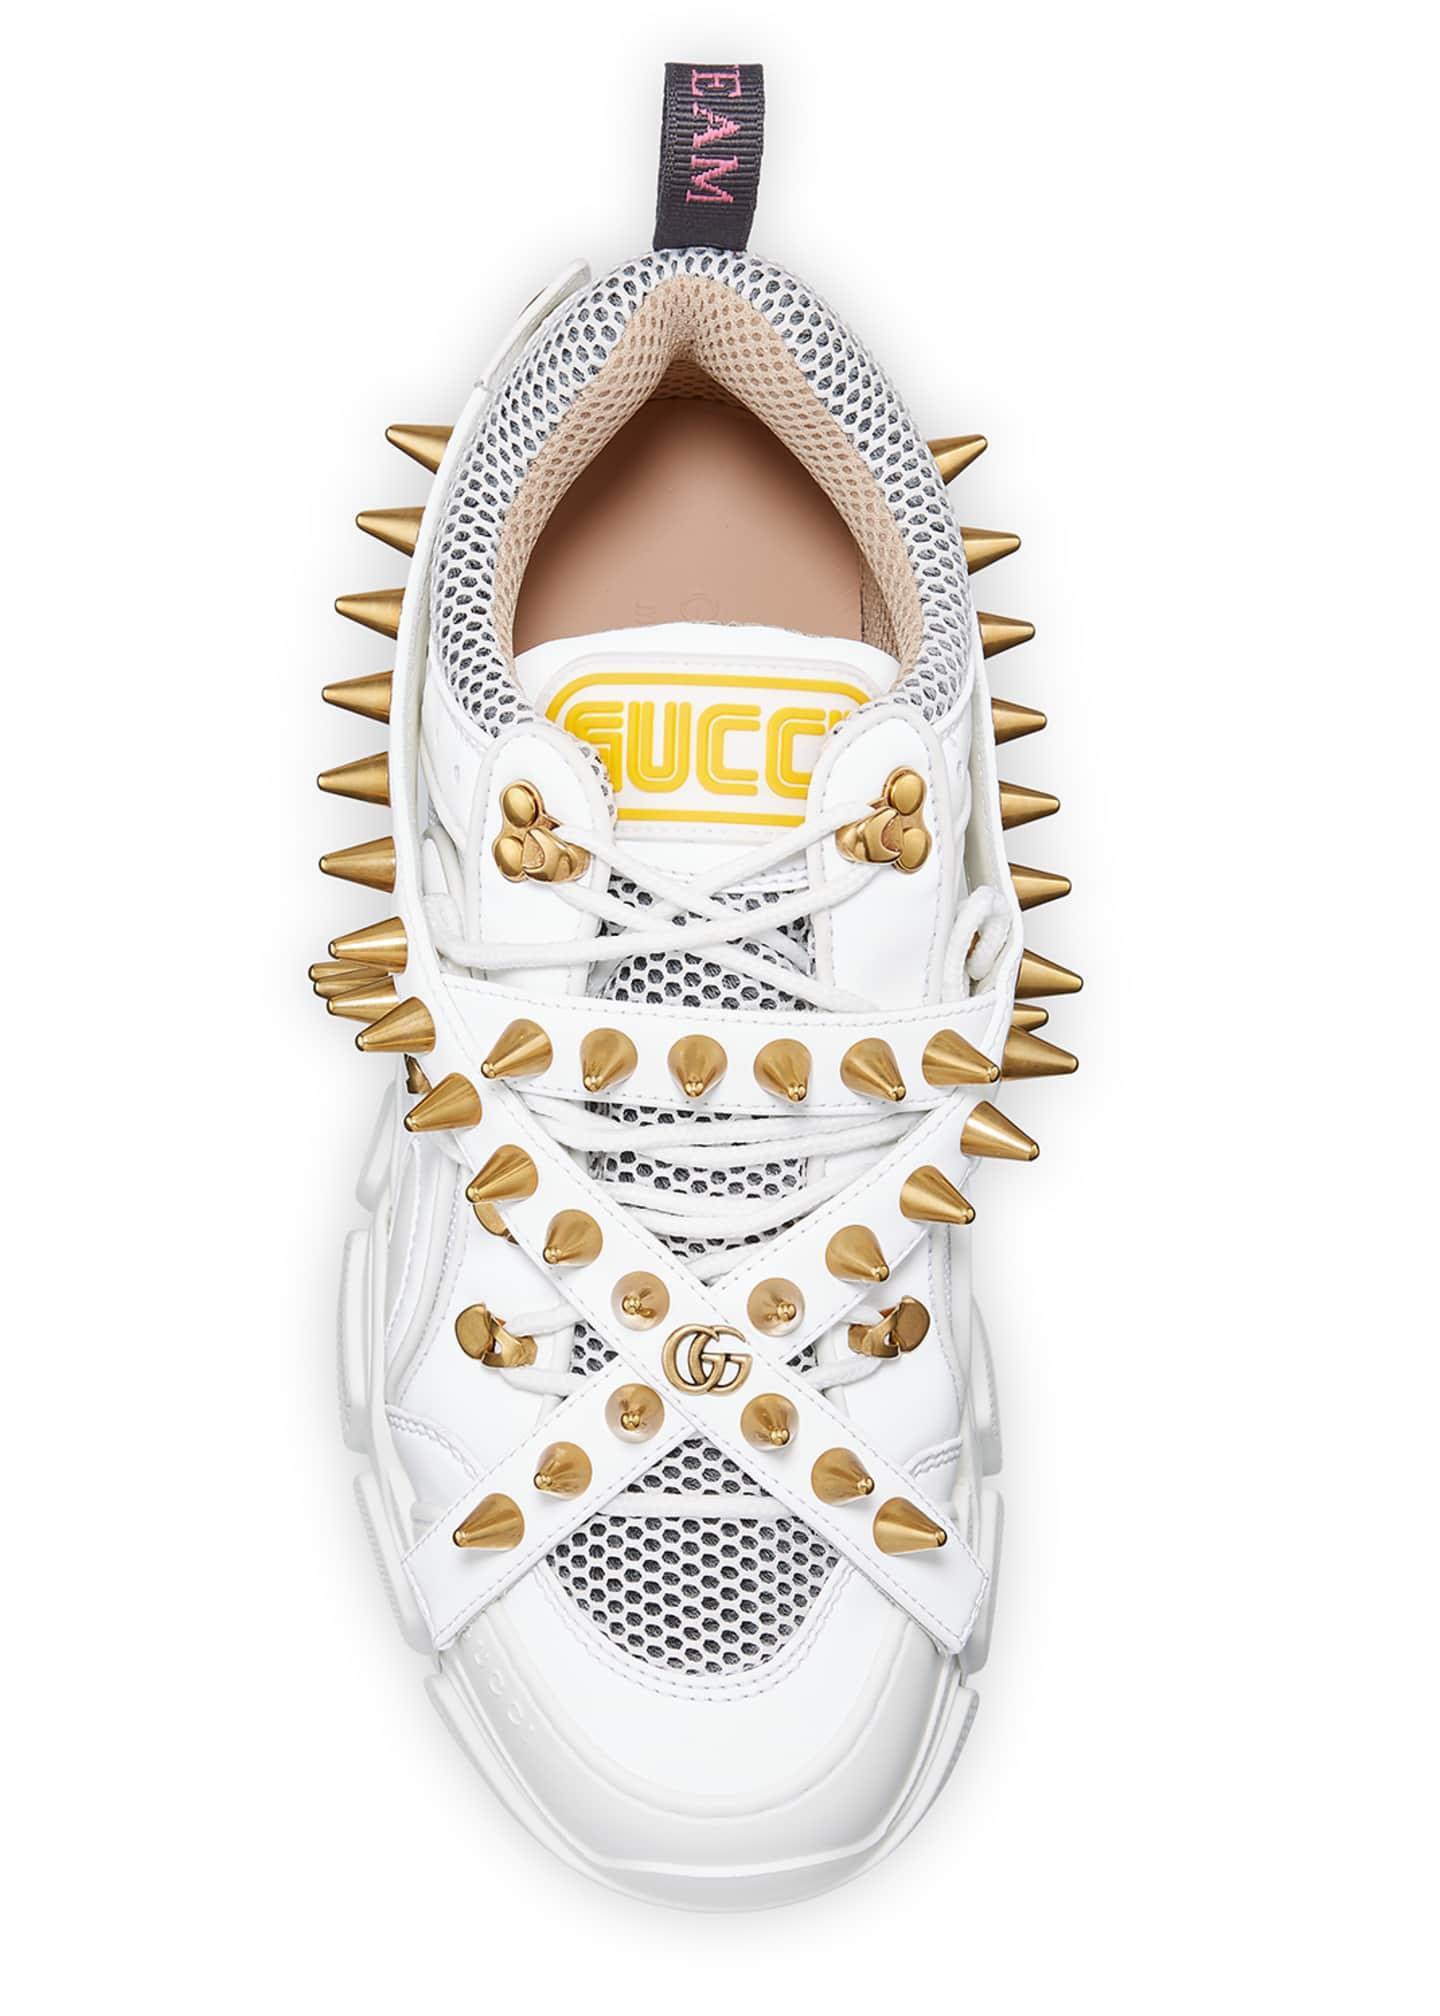 Gucci Flashtrek Removable Spikes